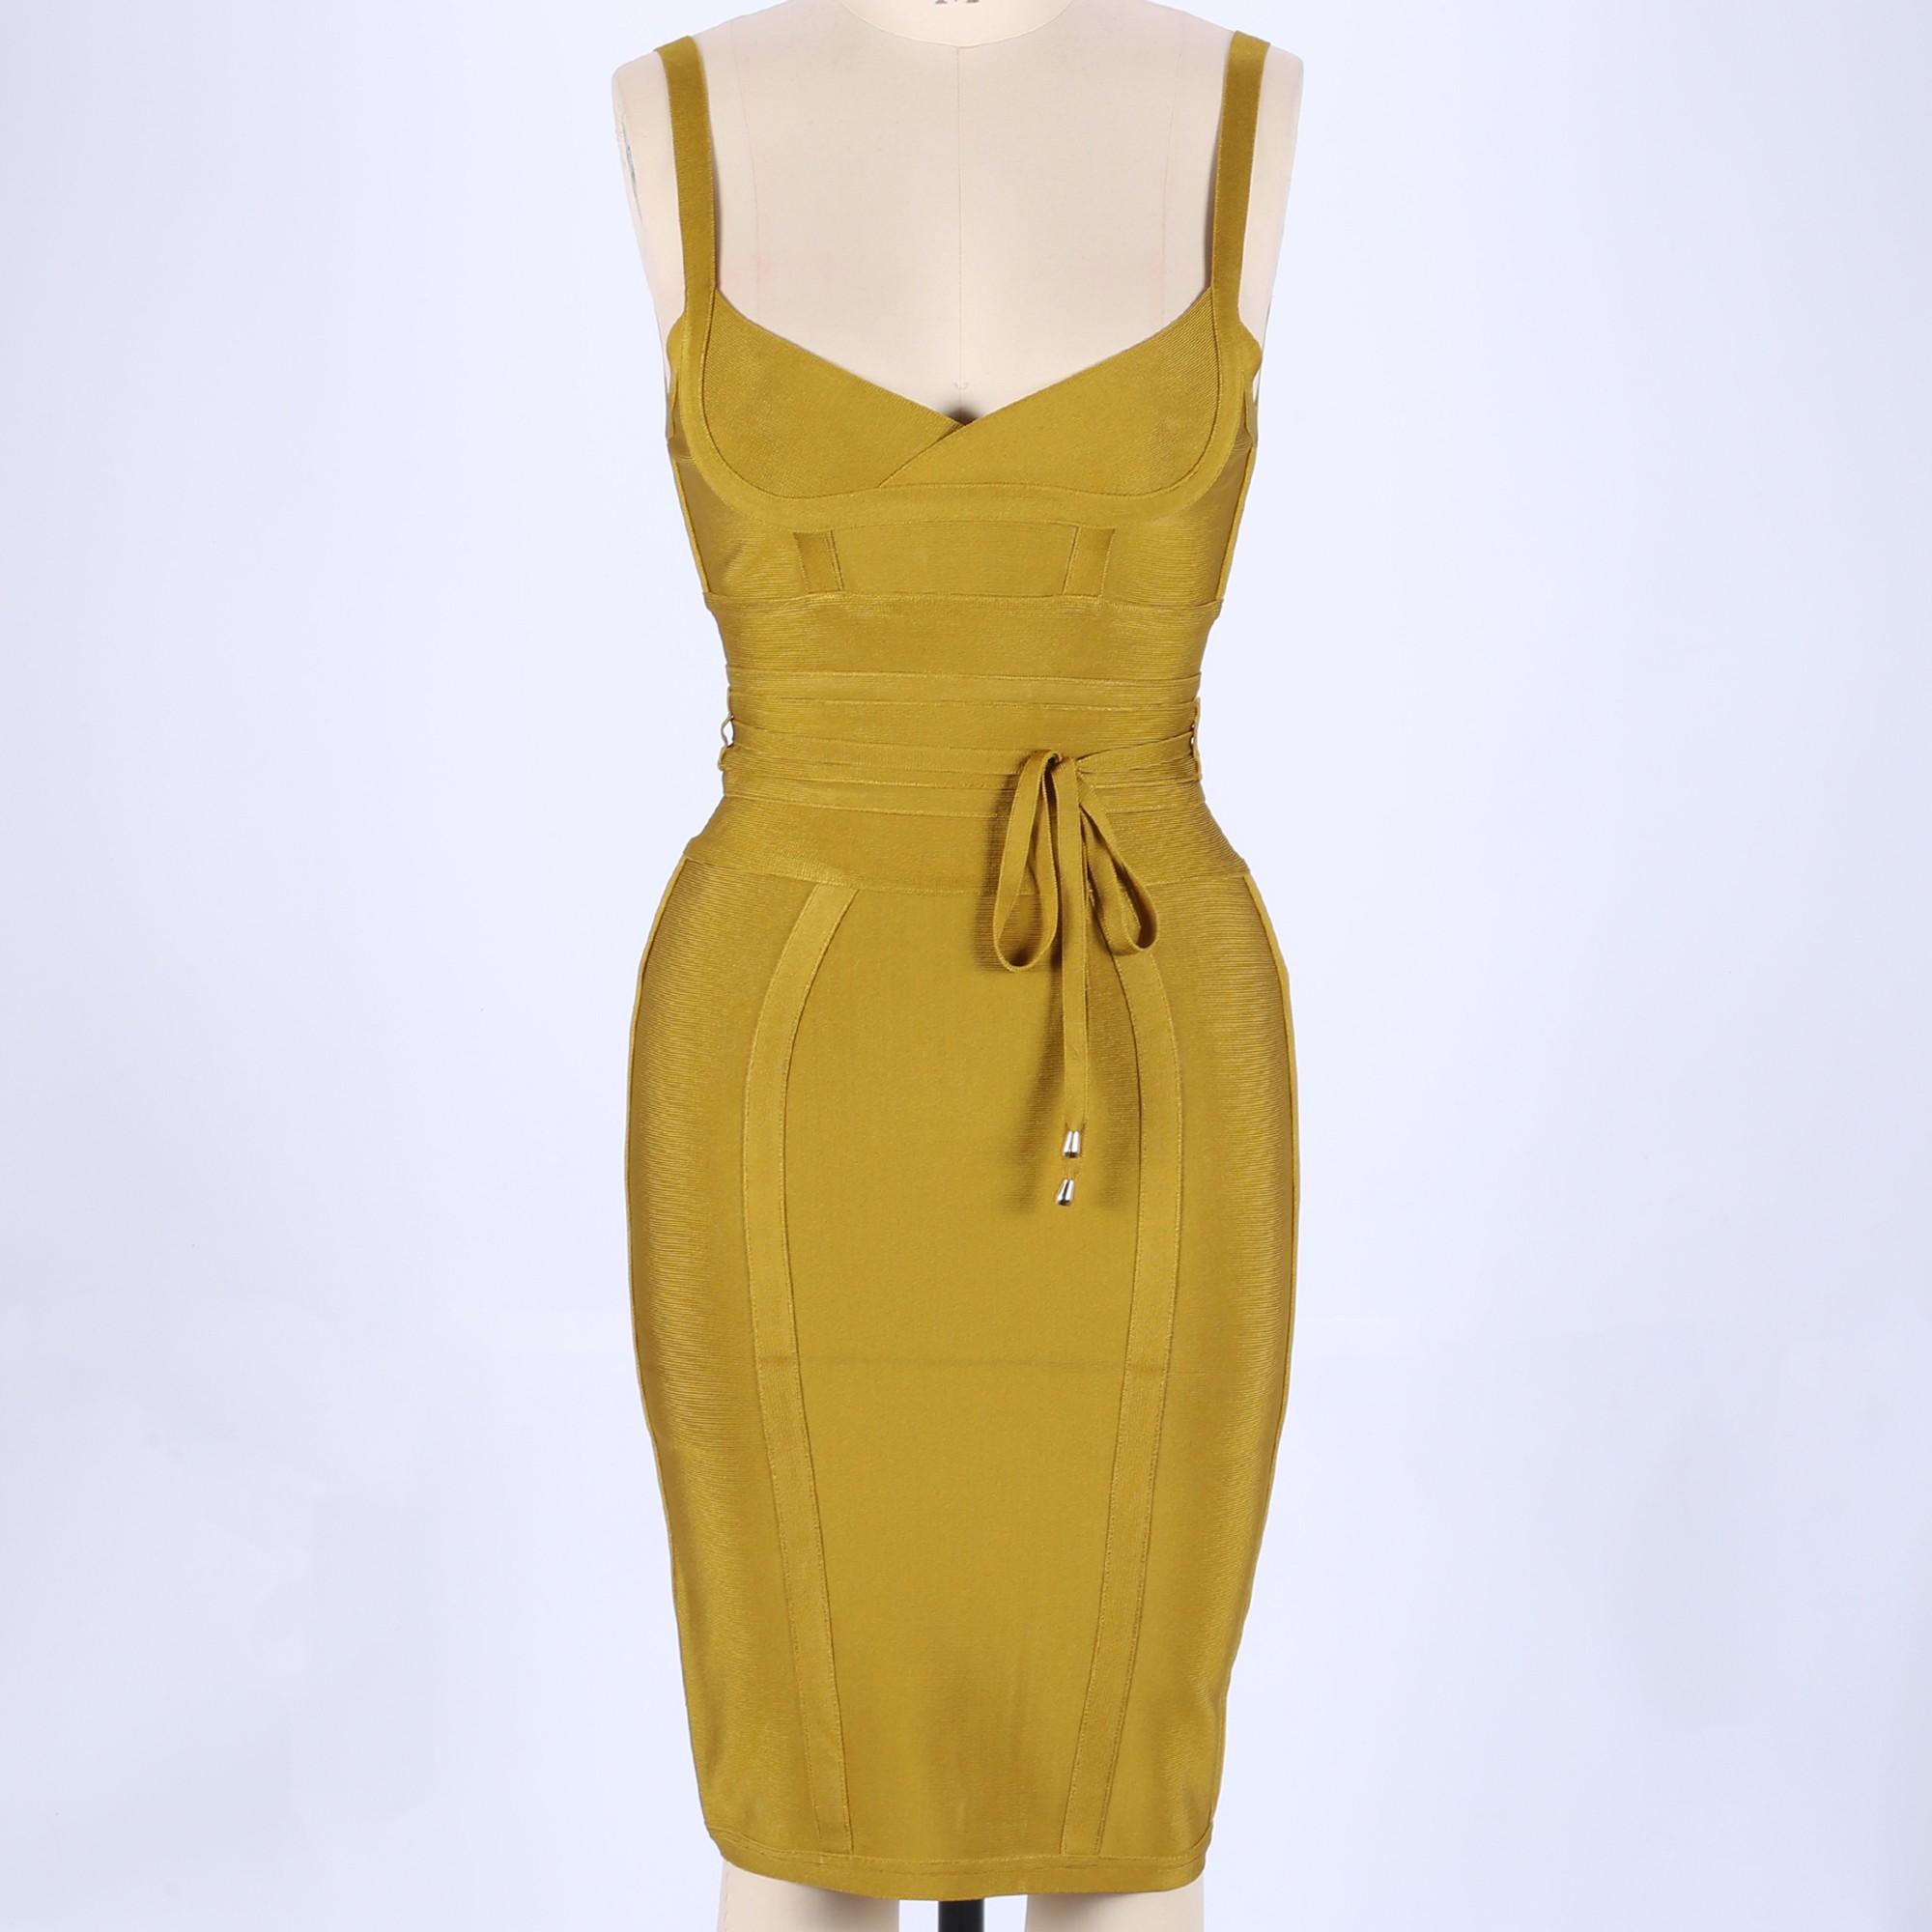 Rayon - Yellow Strapy Sleeveless One Piece Bandage Tie Fashion Bandage Dress HJ448-Yellow